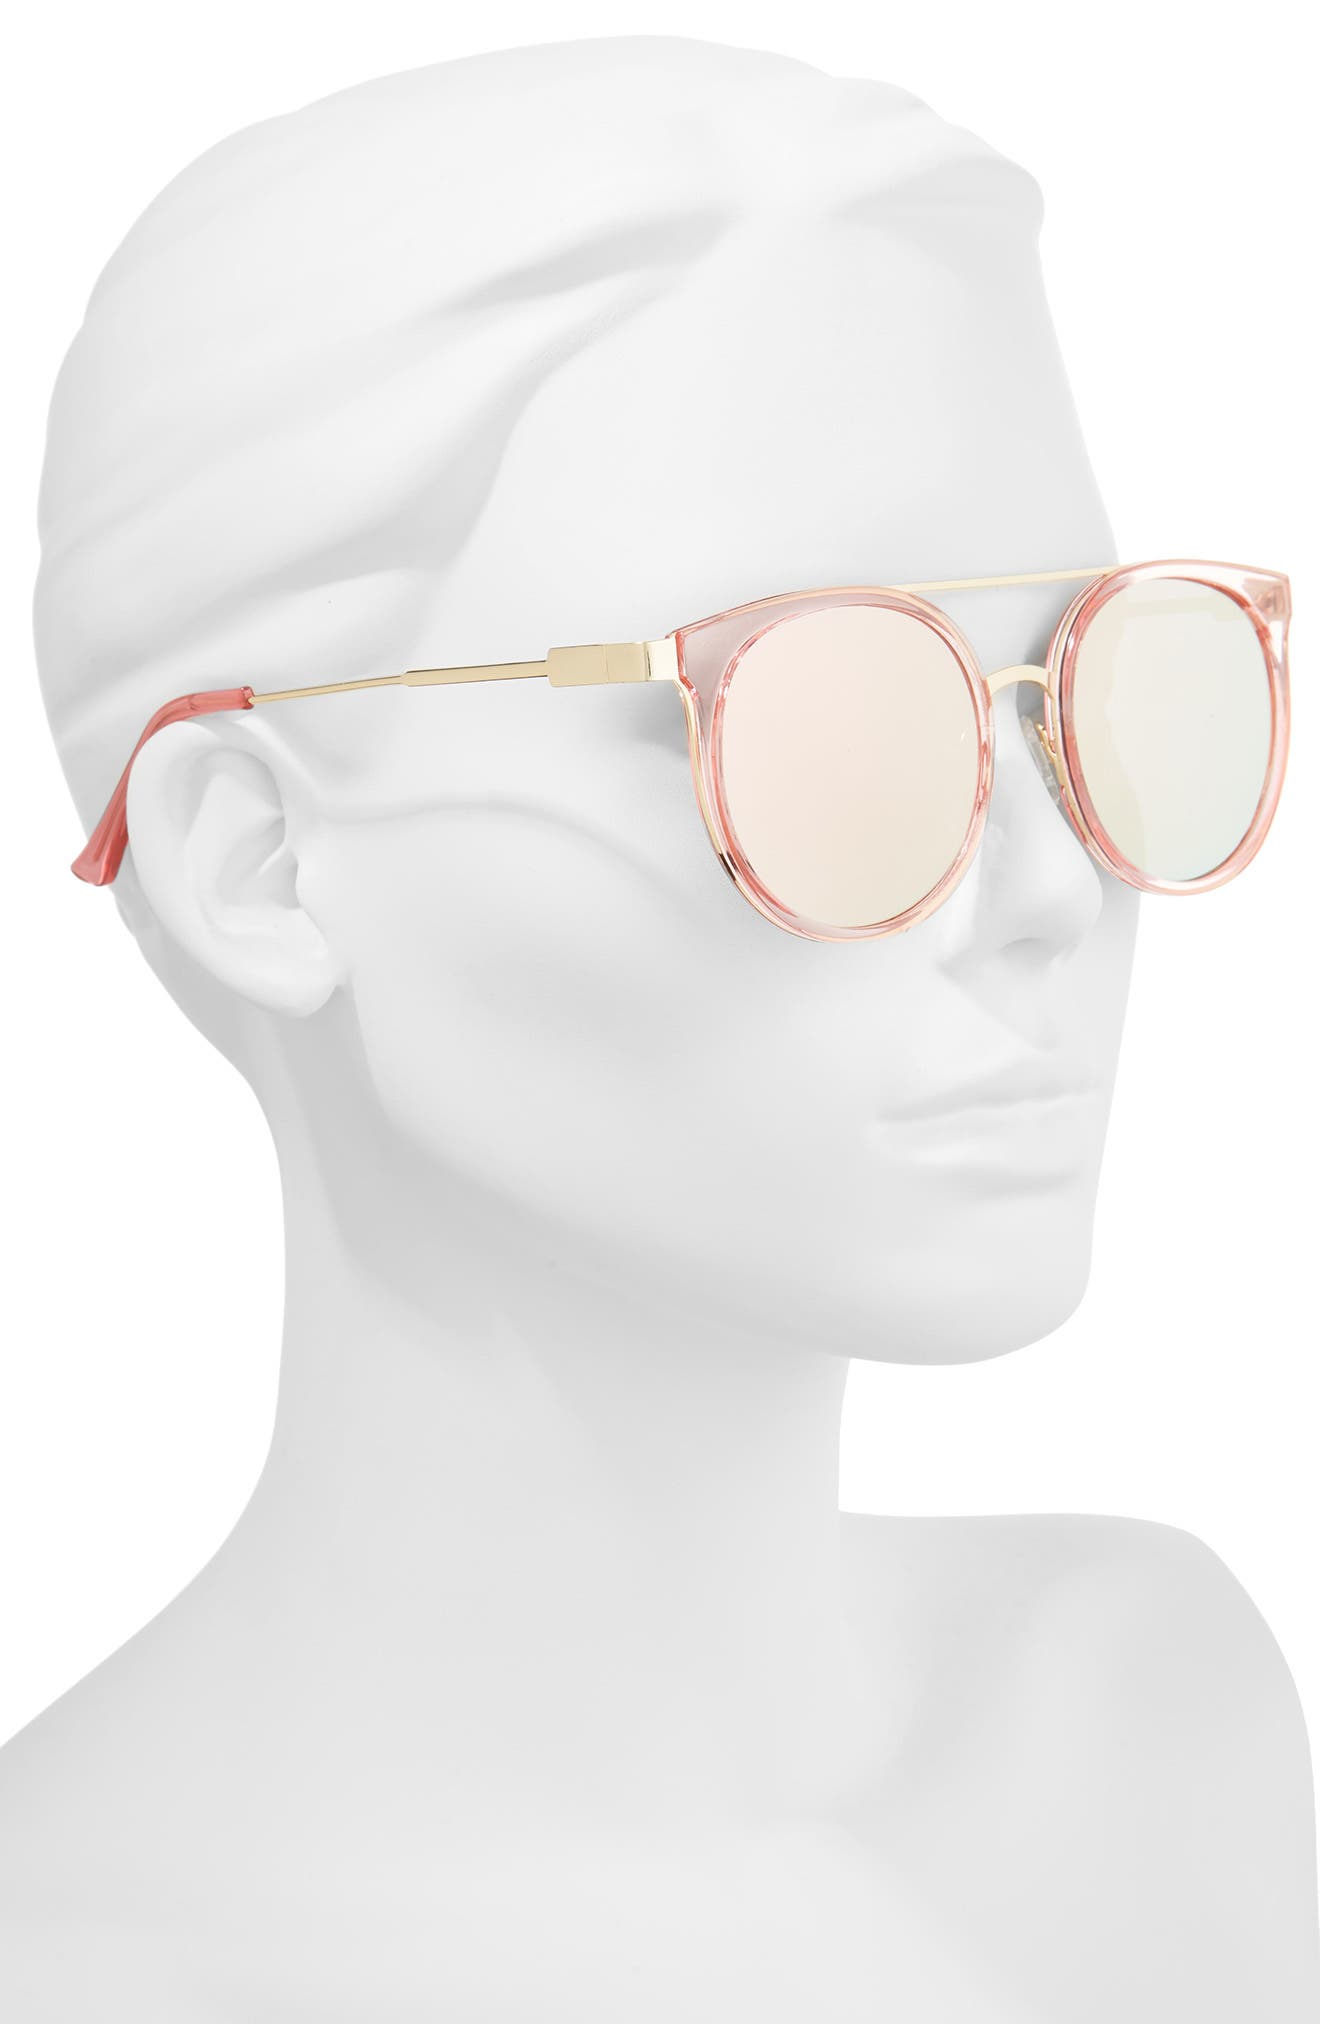 52mm Mirror Lens Round Sunglasses,                             Alternate thumbnail 2, color,                             710